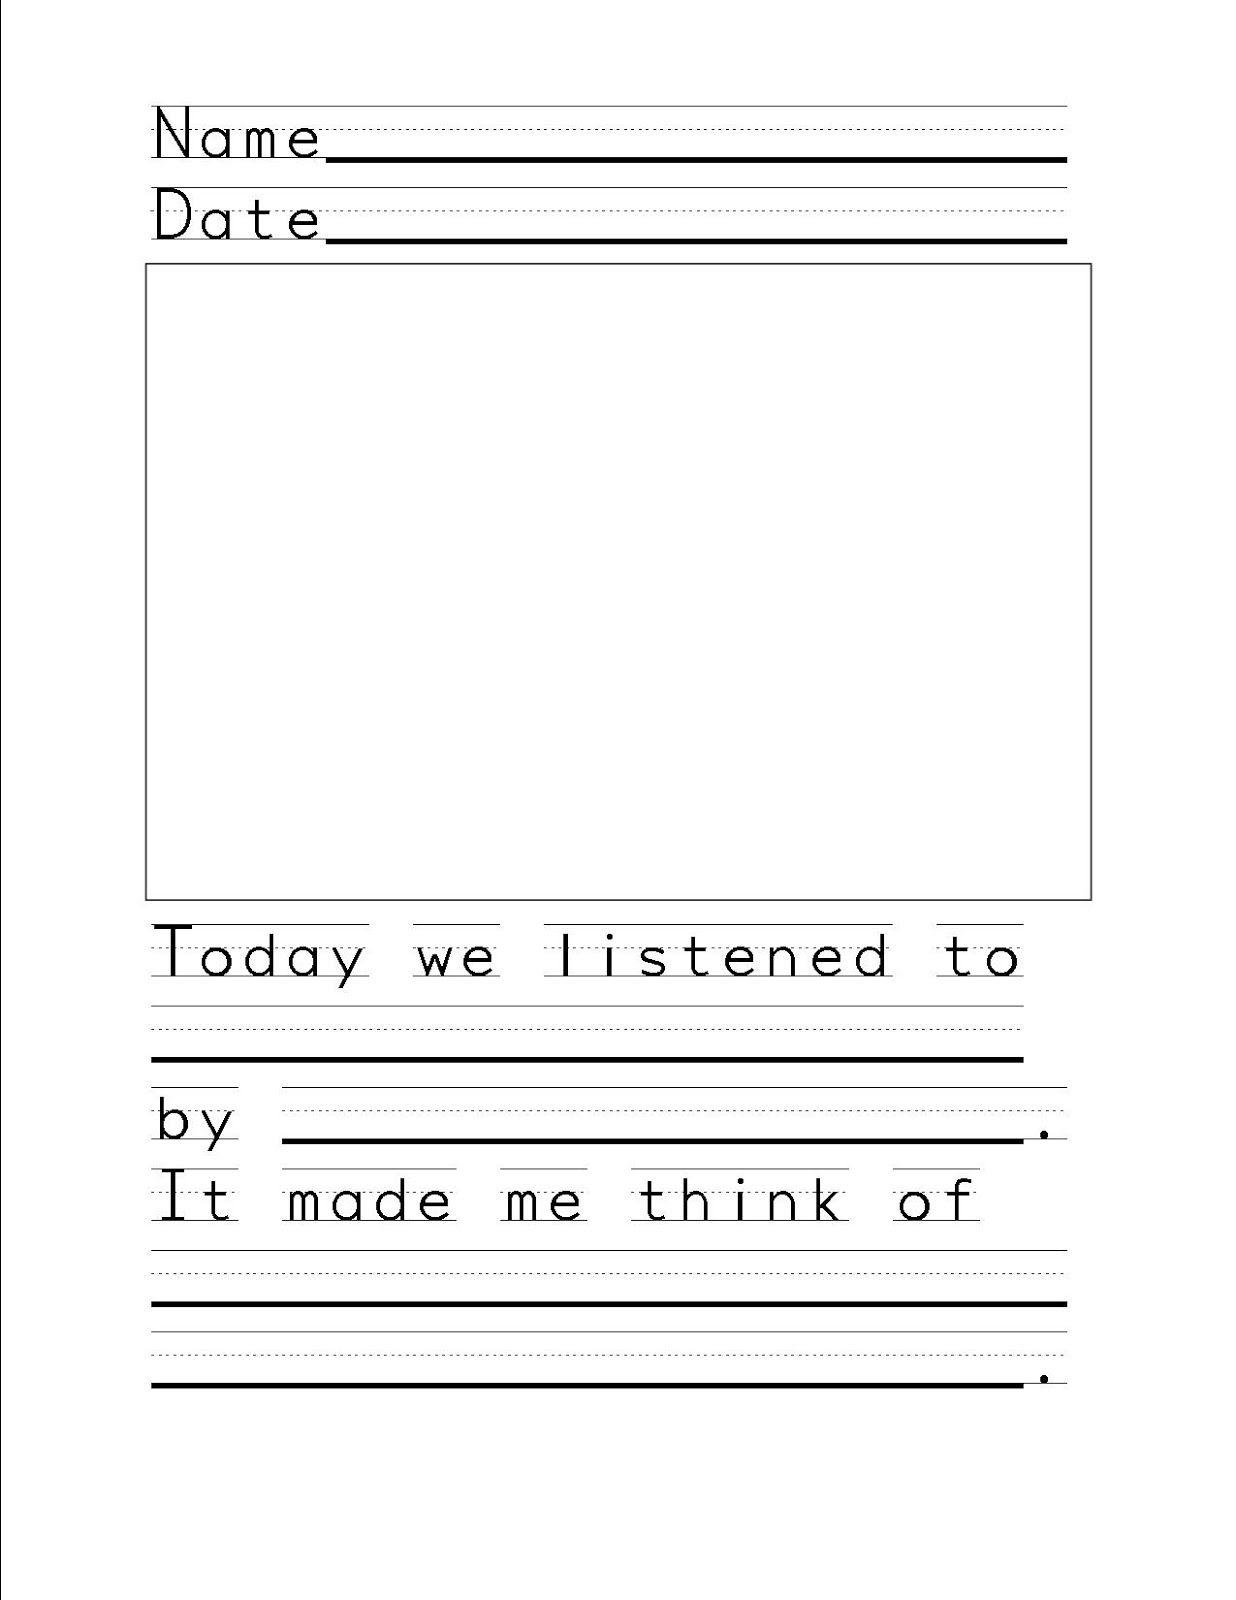 Elementary Music Class Listening Response Sheet Elementary Music Class Kindergarten Music Music Classroom